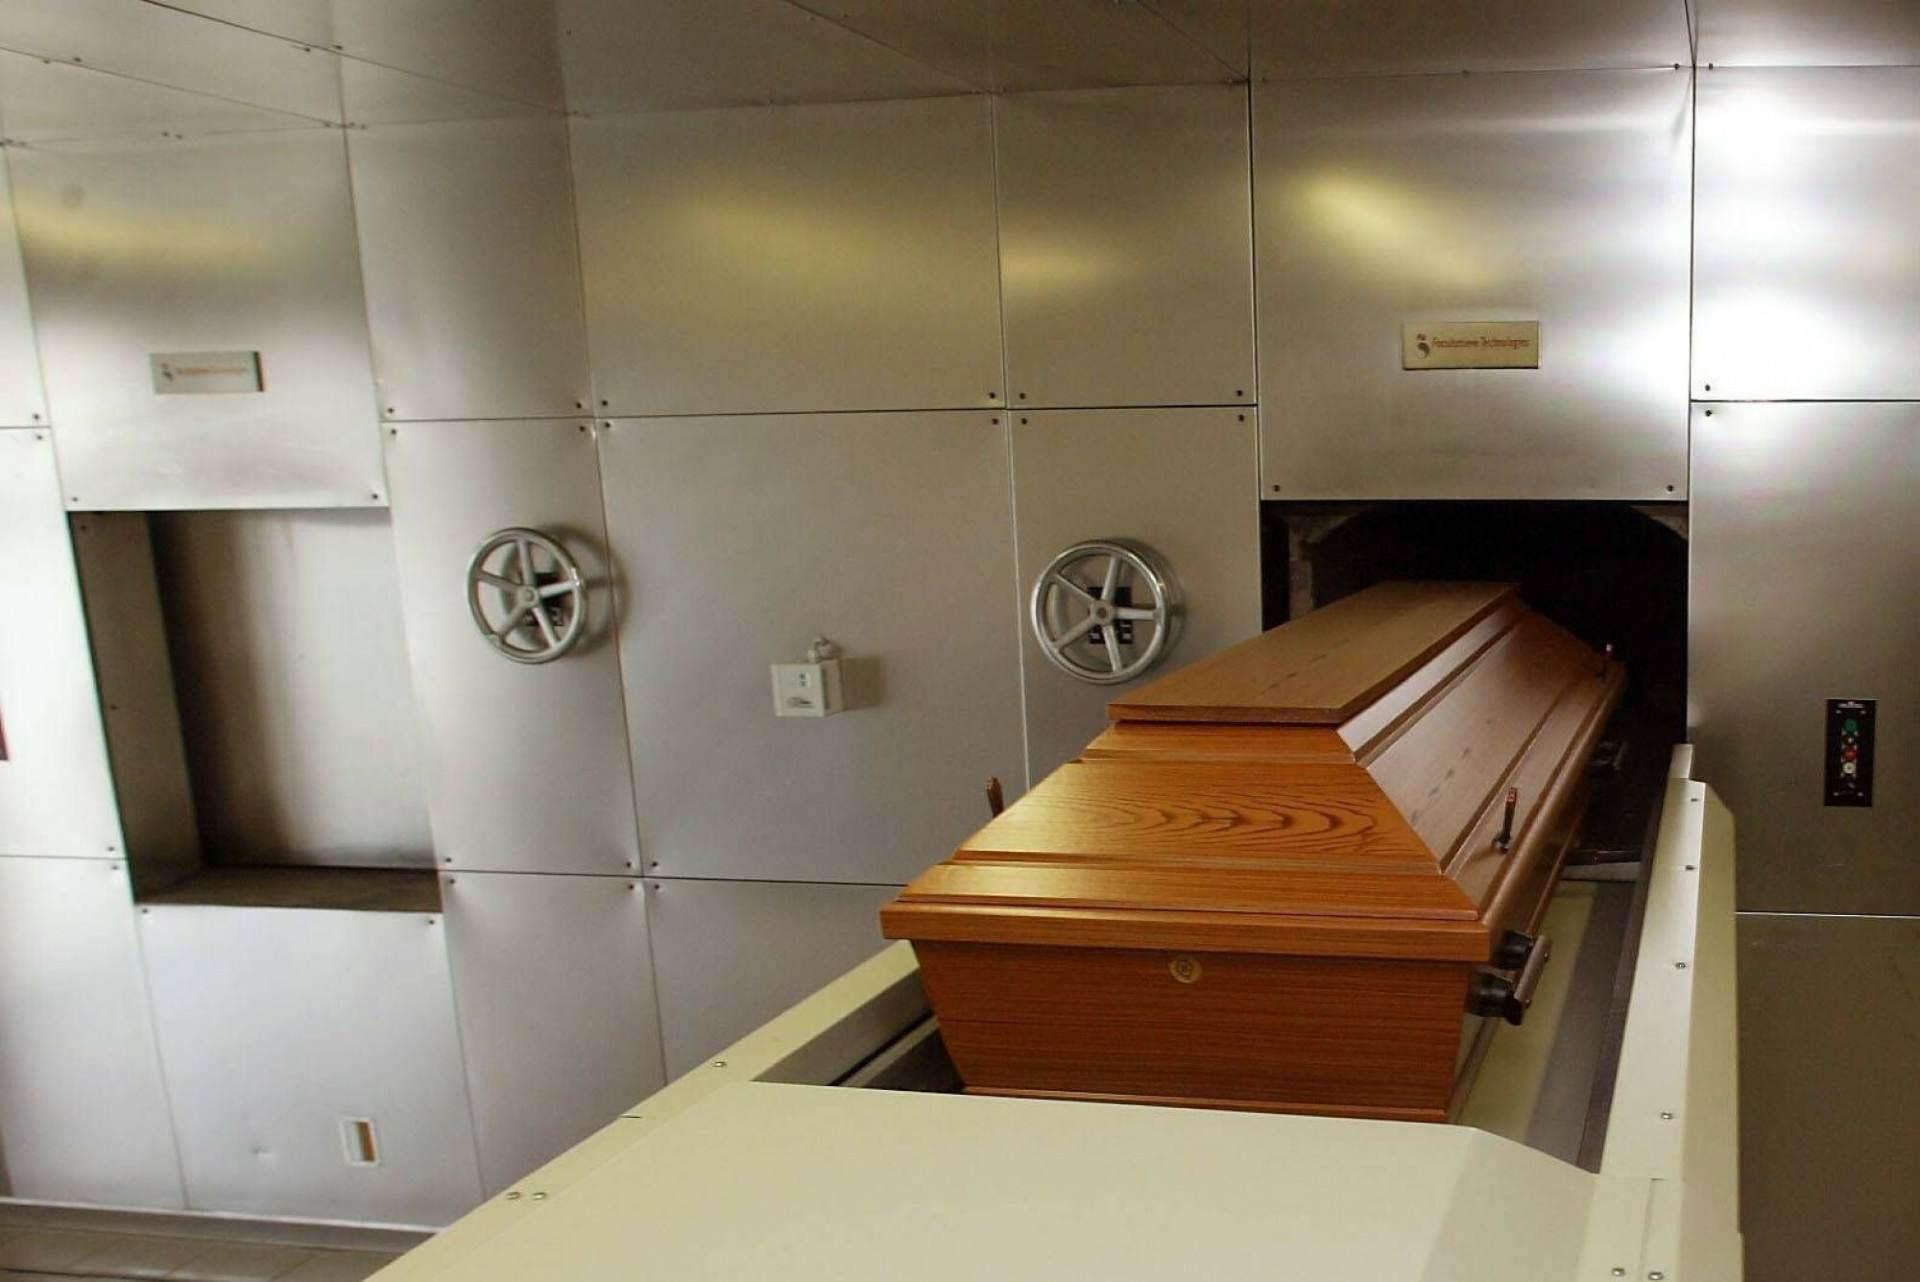 rodzina-wybuch-krematorium